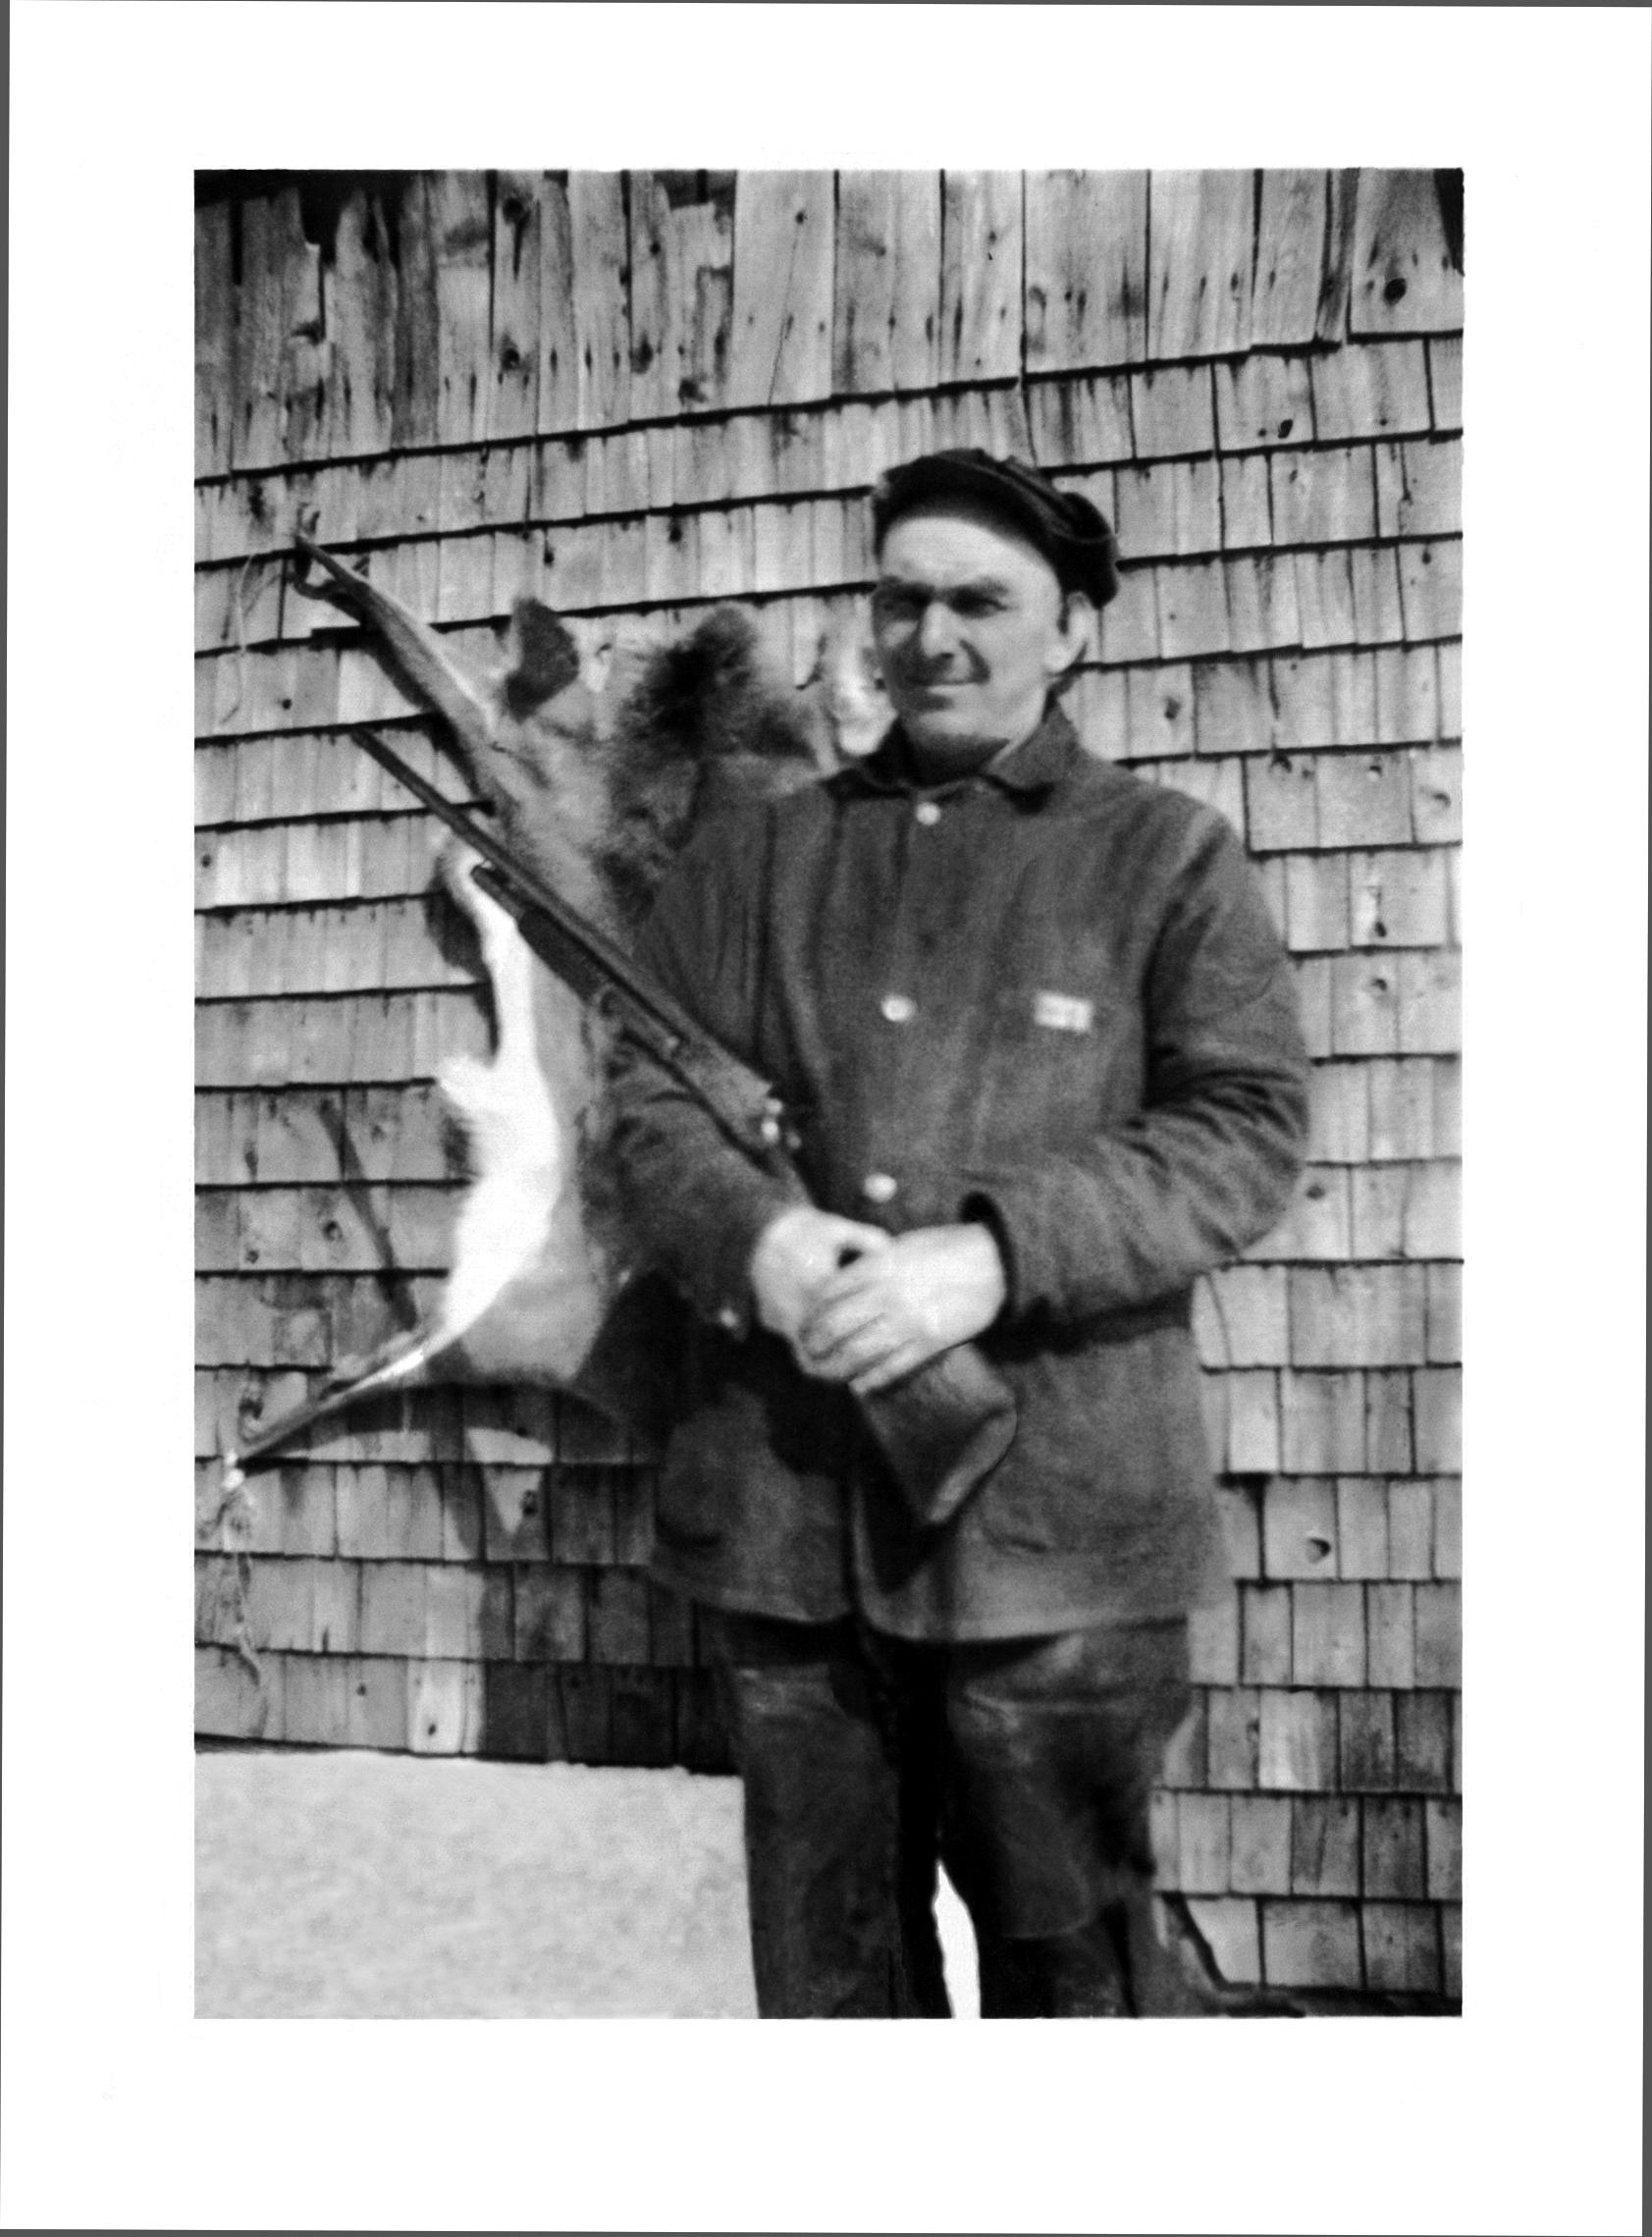 Uncle Alvie with Marlin model 24 Shotgun